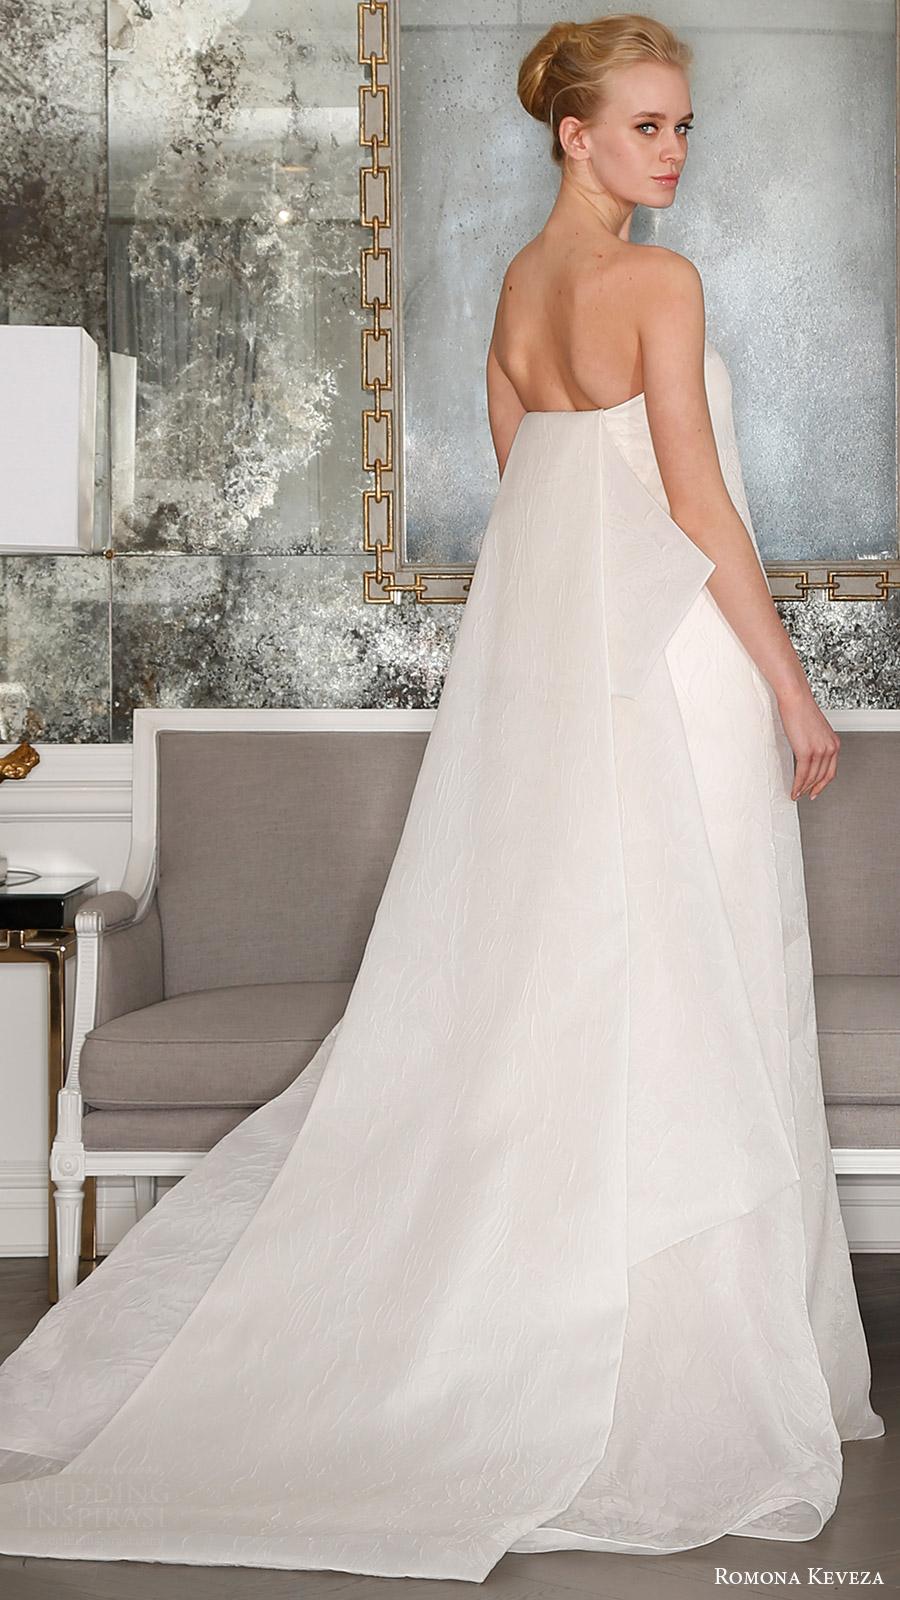 romona keveza bridal spring 2017 strapless straightacross tent wedding dress (rk7401) bv detachable obi train